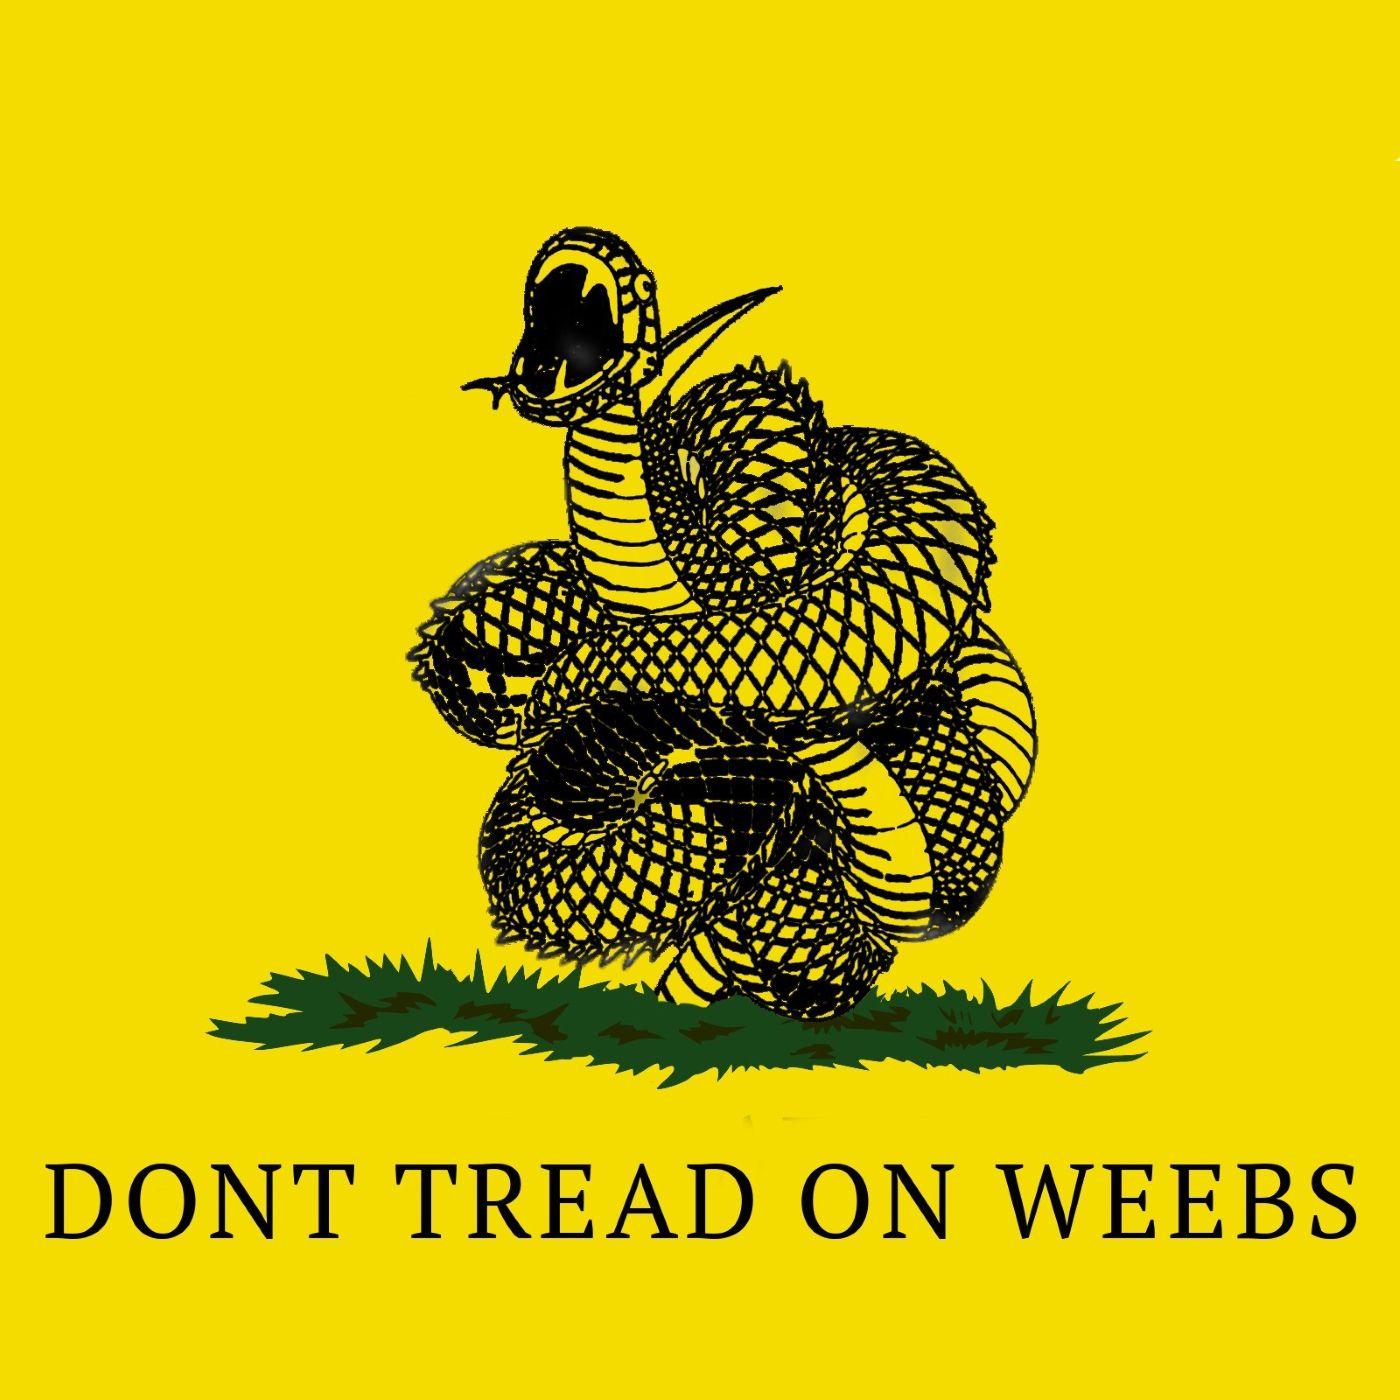 Don't Tread on Weebs